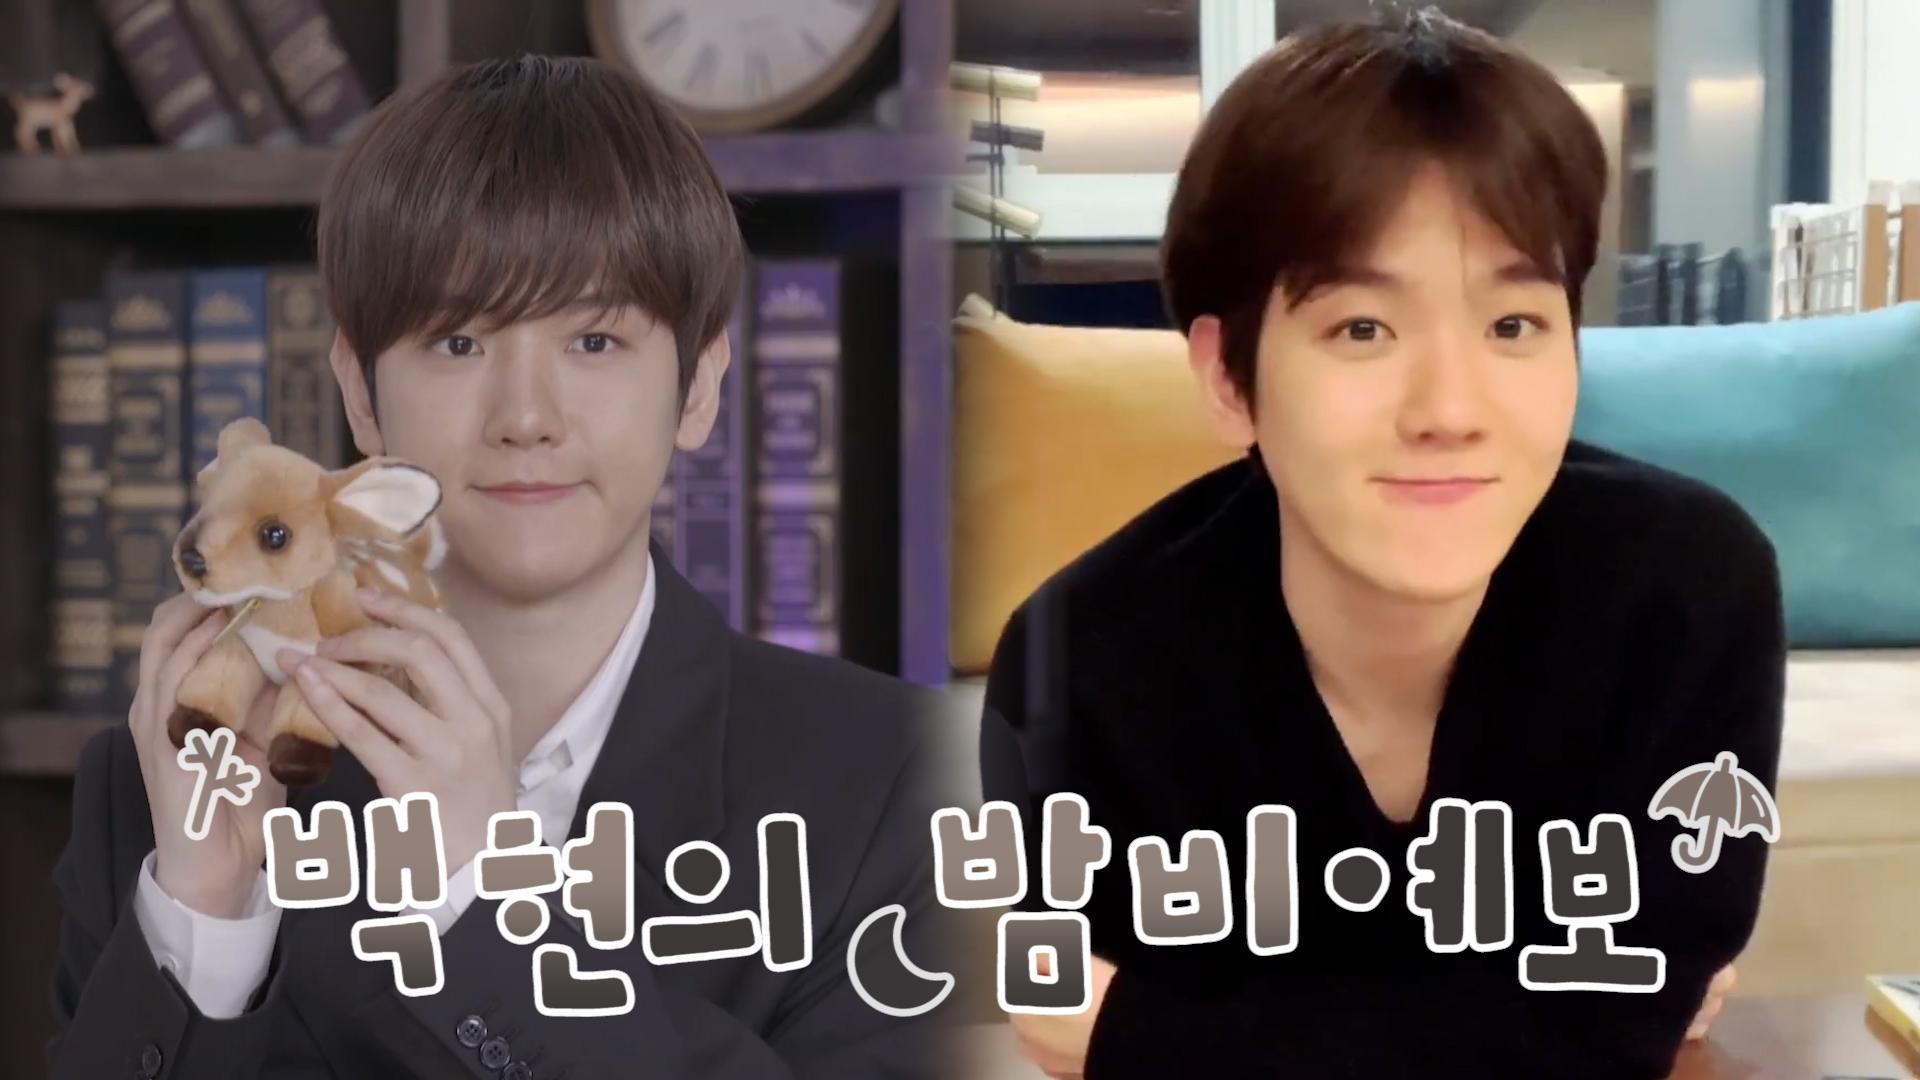 [EXO] 변백현 정말 유일무이 원앤온리 마이 라스트 아이돌❣️👍(BAEKHYUN talking about his new album 'Bambi')